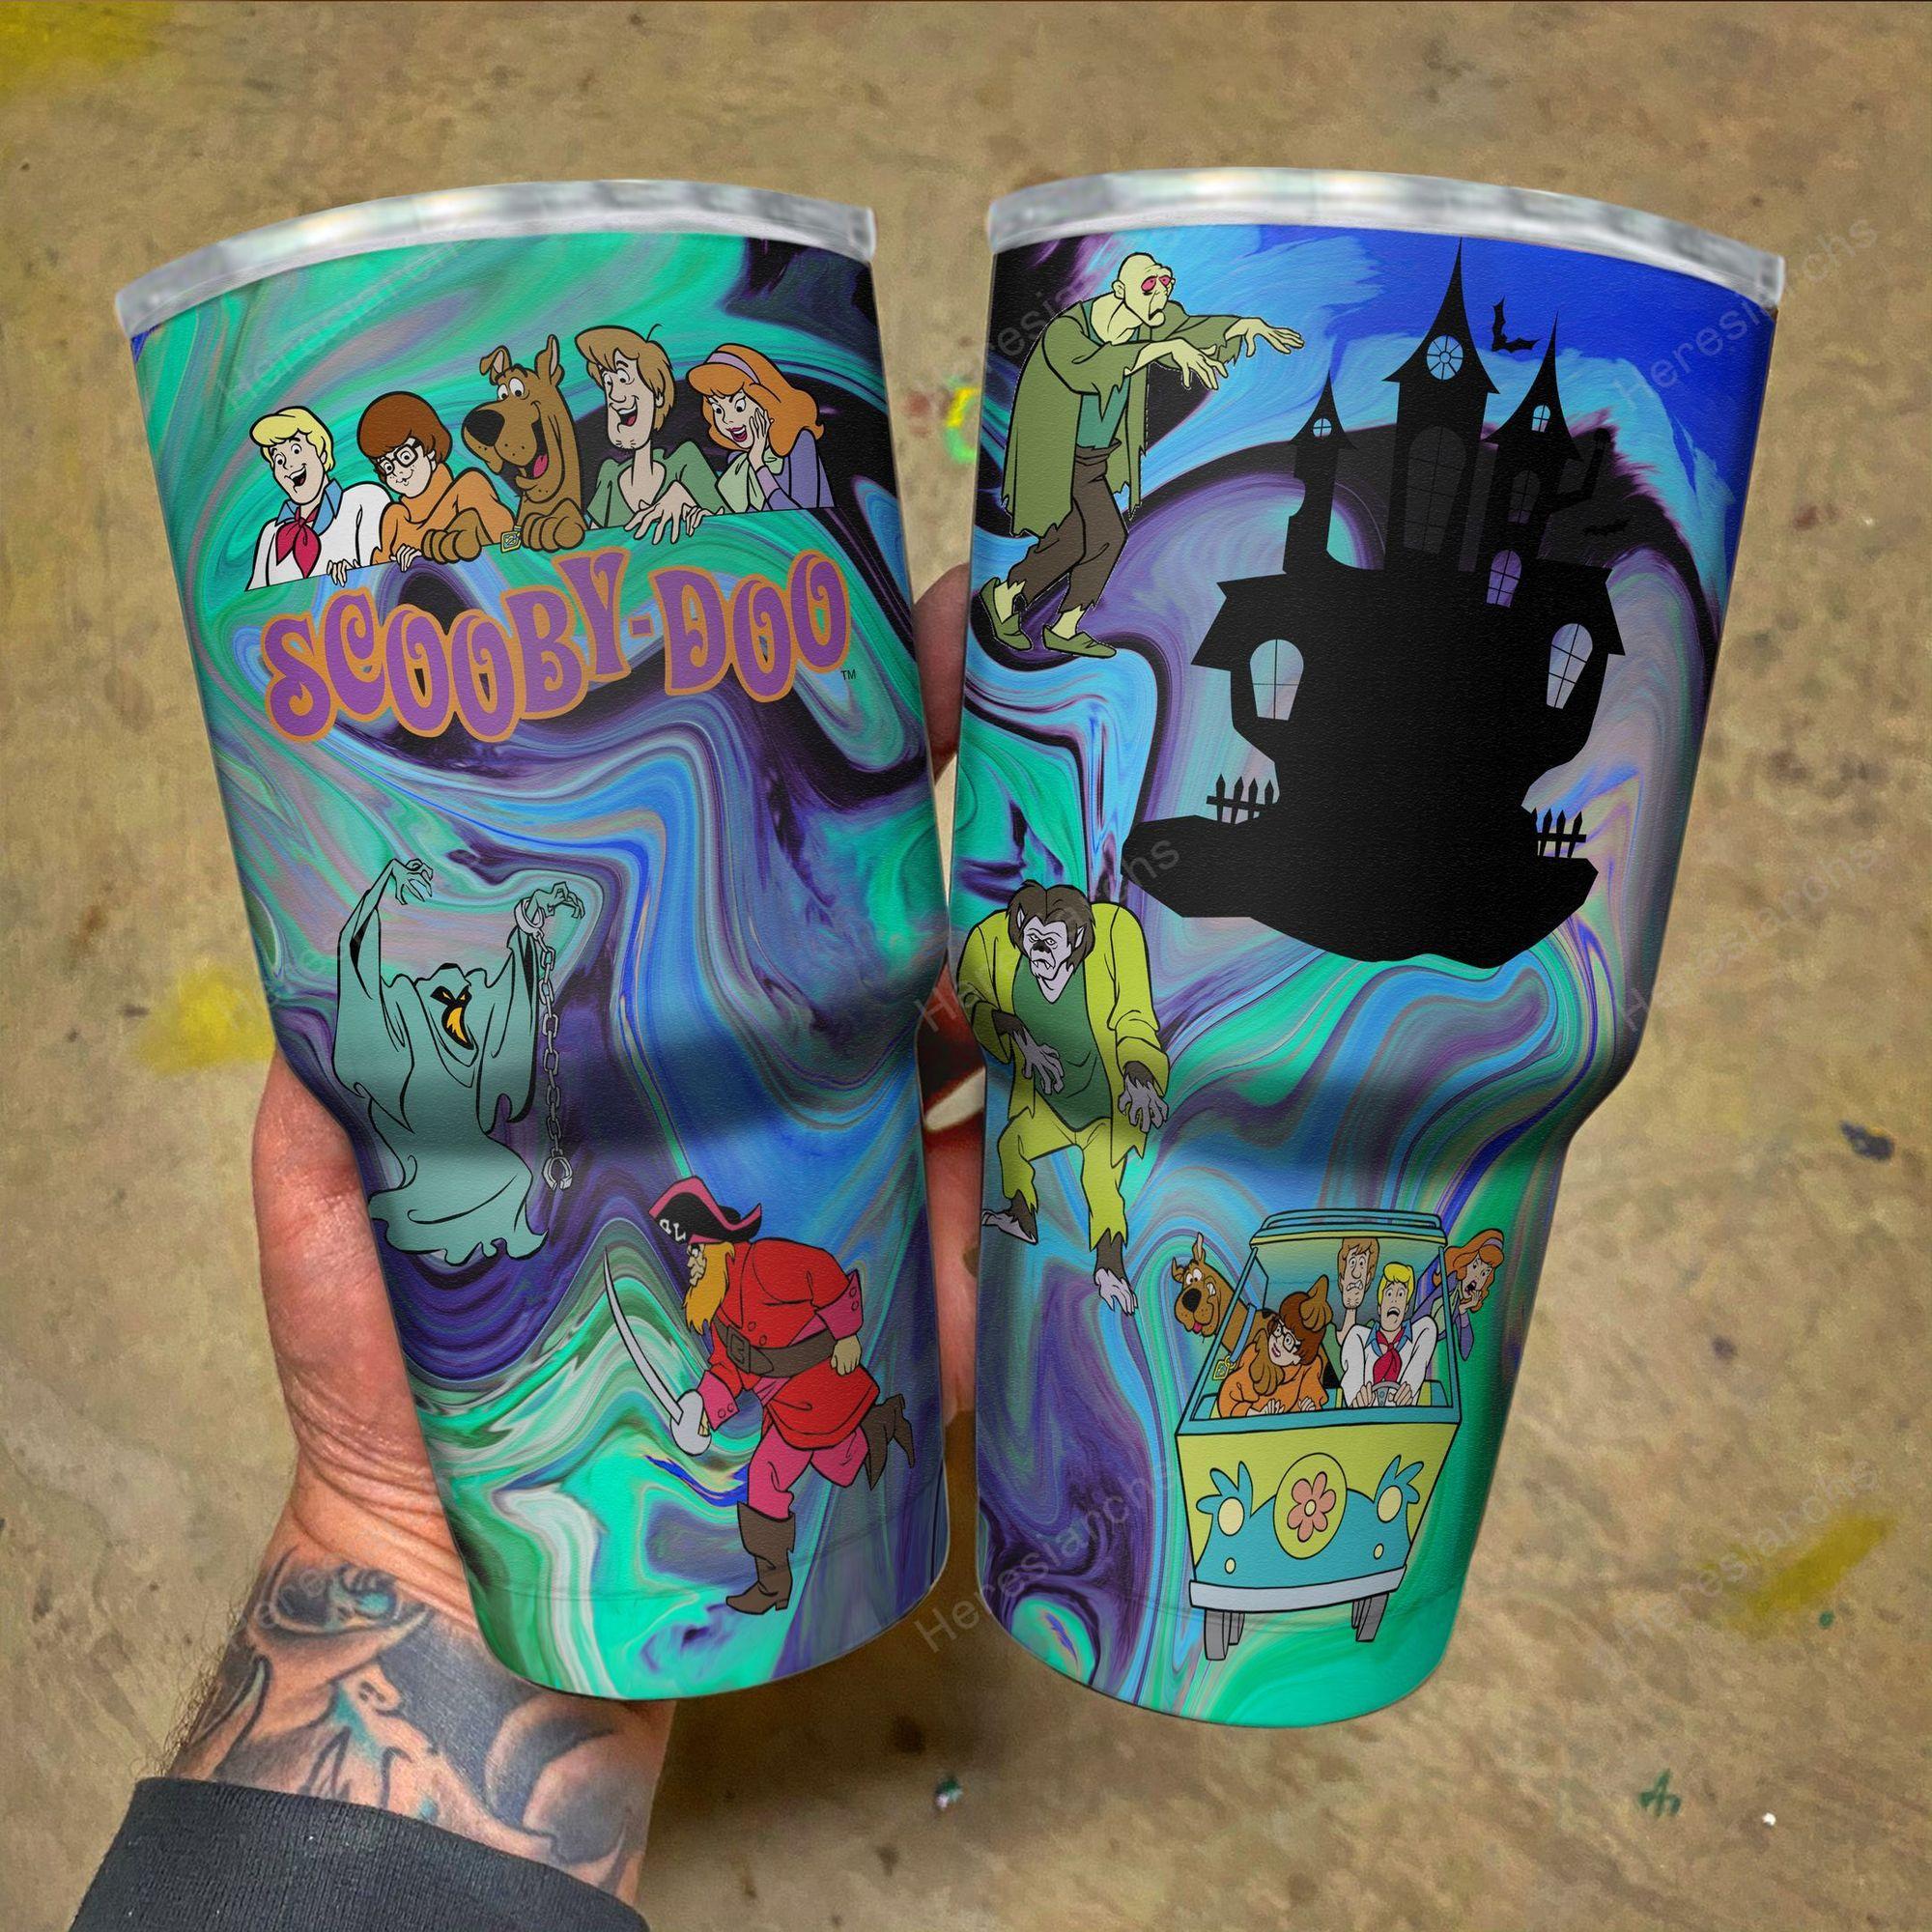 80s Cartoon Scooby Doo Tumbler 2